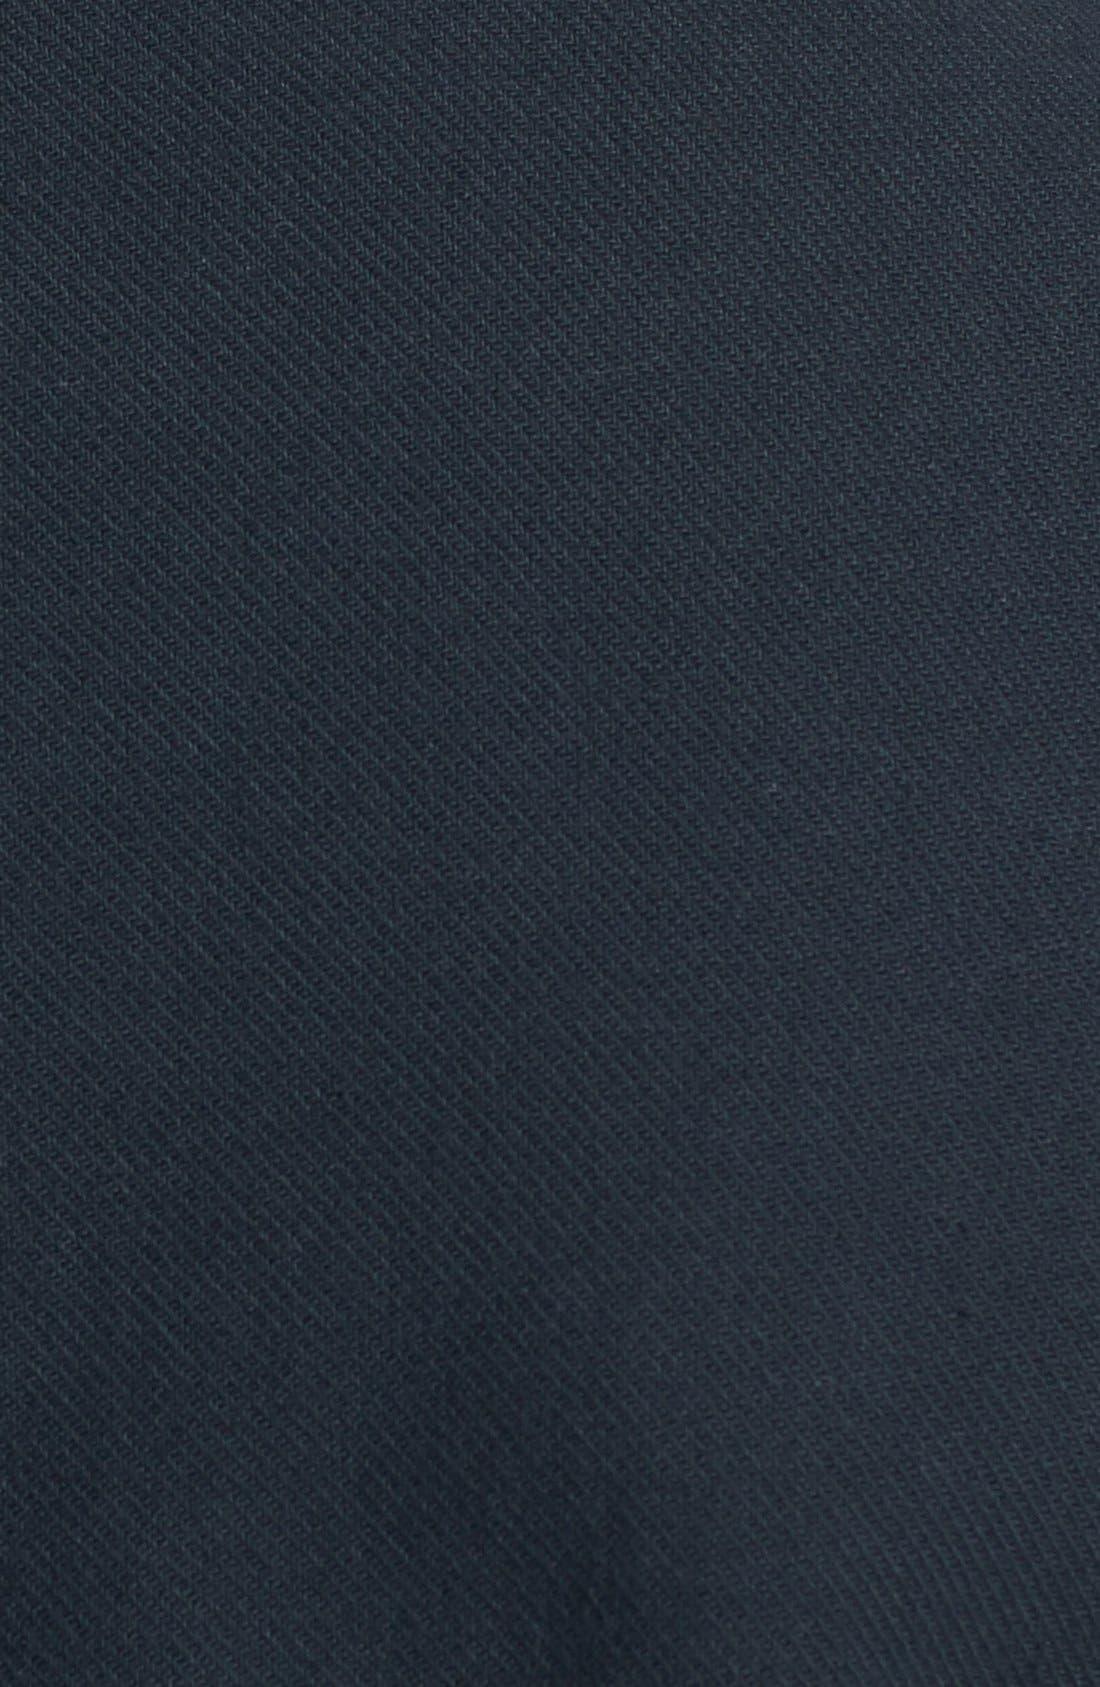 Alternate Image 3  - G-Star Raw 'Correct' Work Shirt